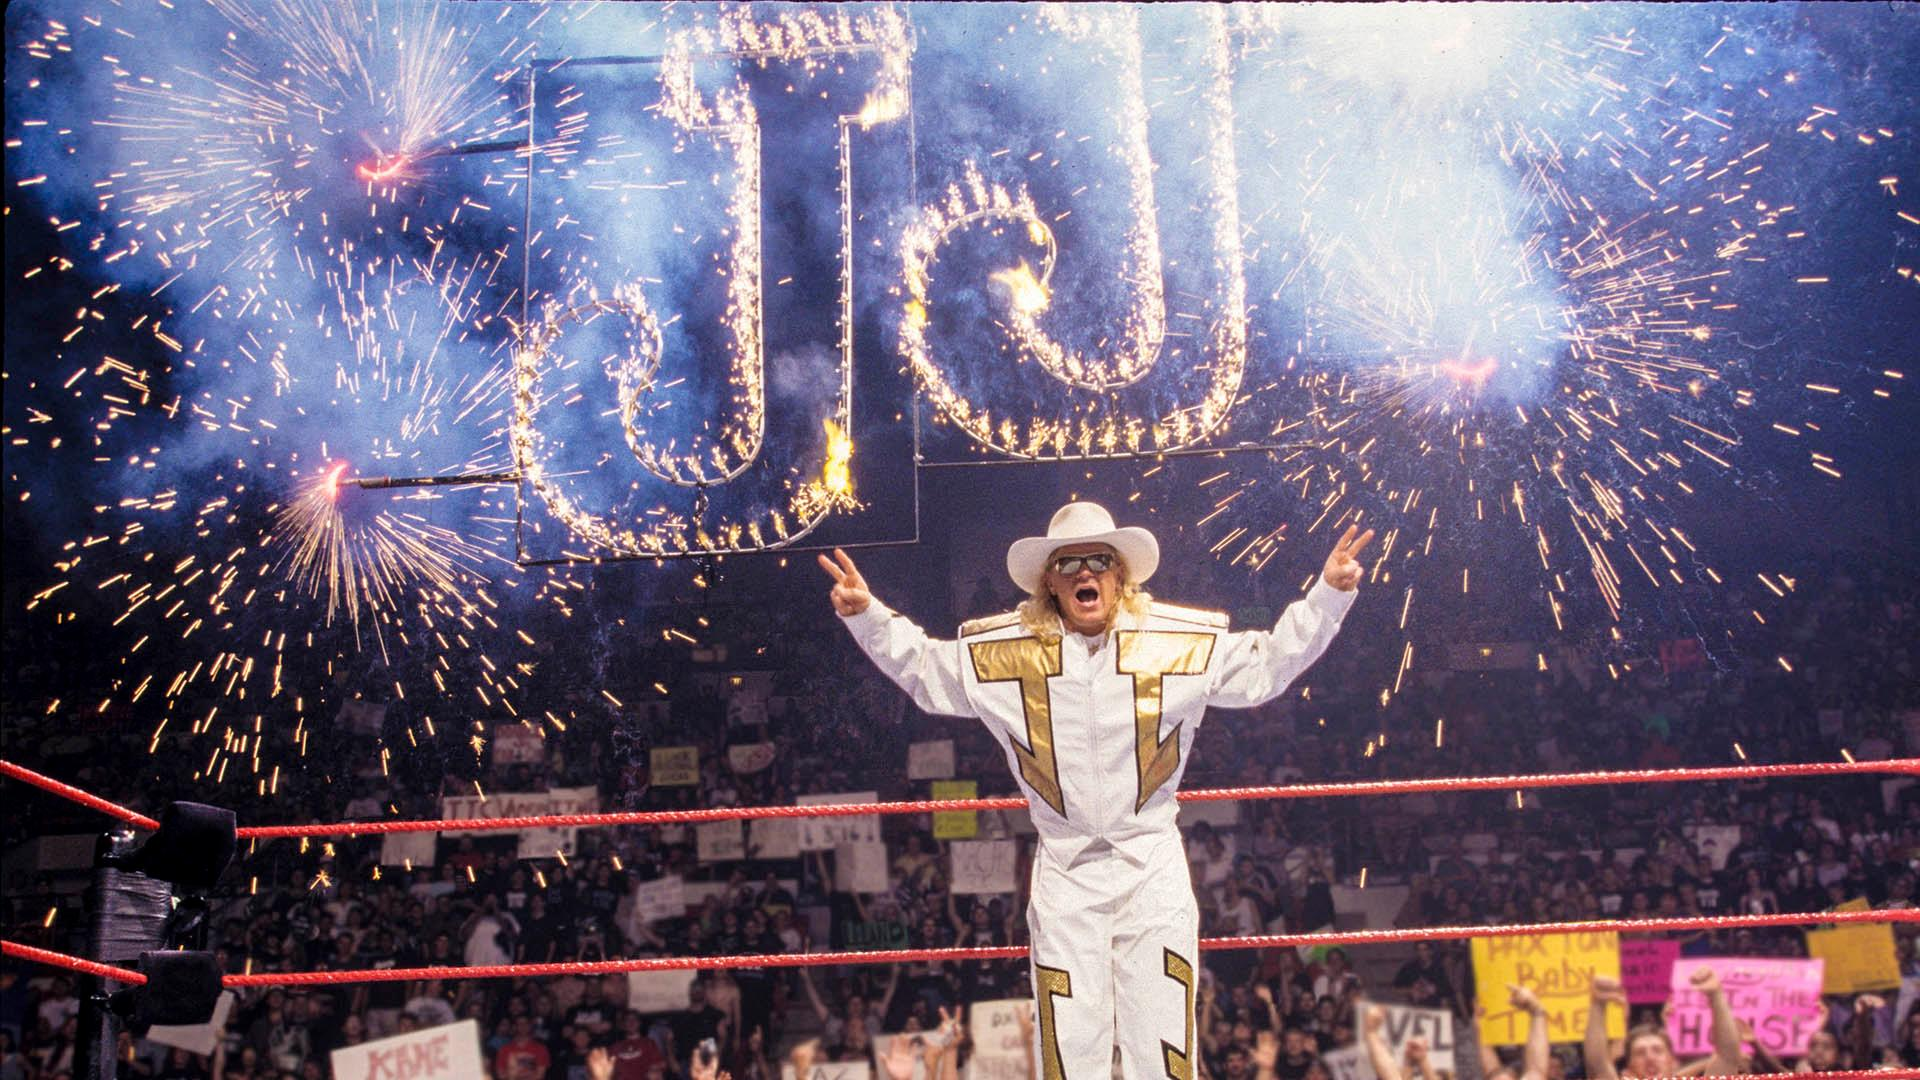 BREAKING: @RealJeffJarrett is the newest member of @WWE's 2018 Hall of Fame Class https://t.co/zwo6fsipN2 https://t.co/7sVlvSEHxg